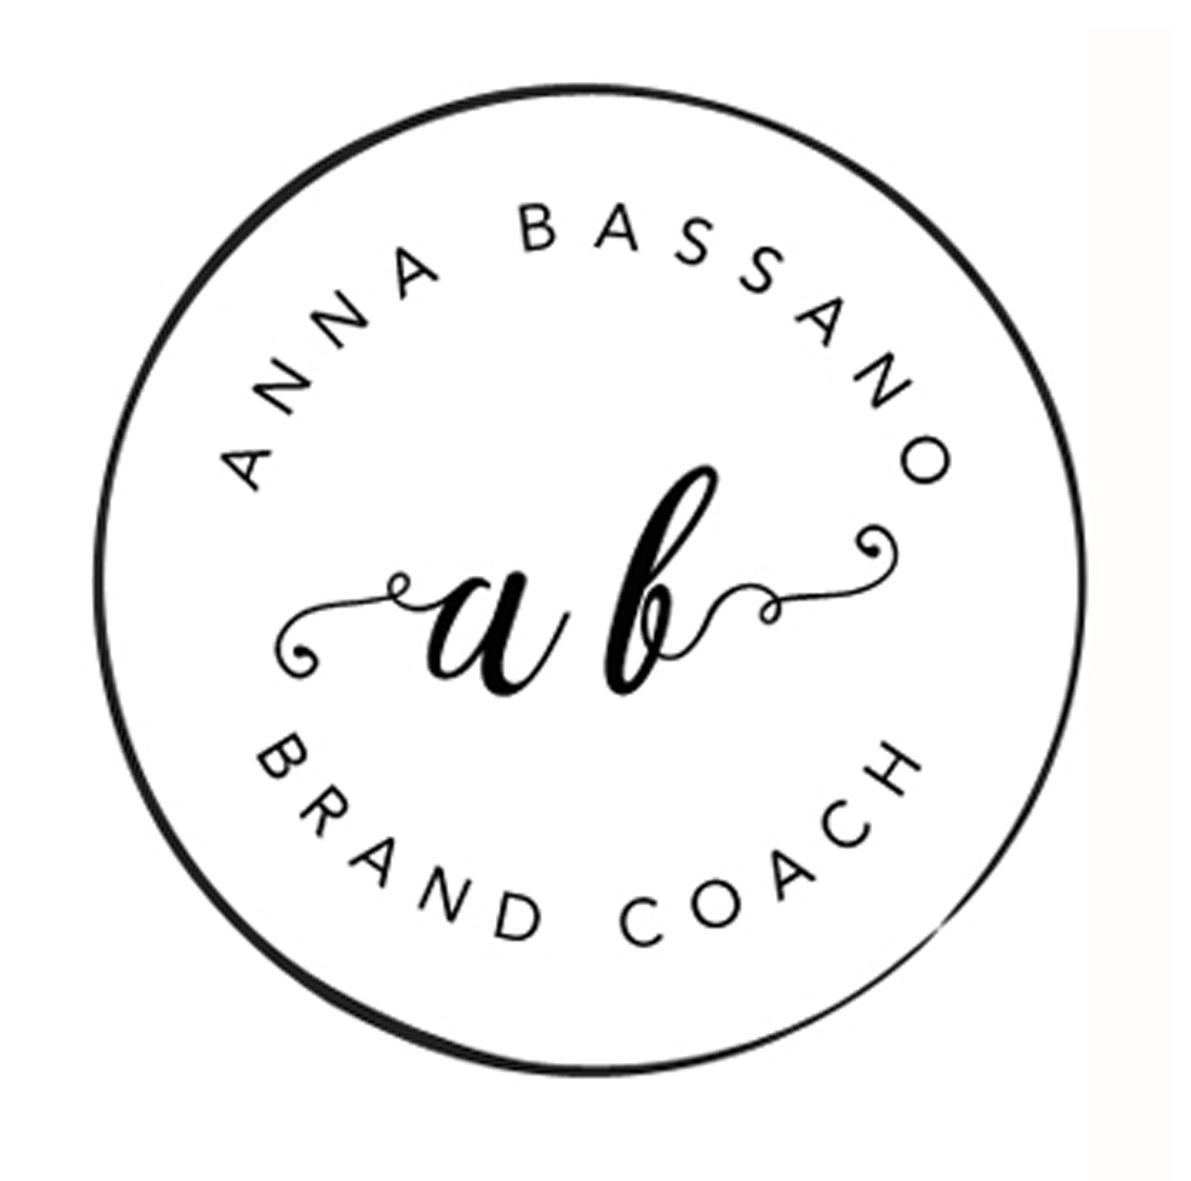 Anna Bassano